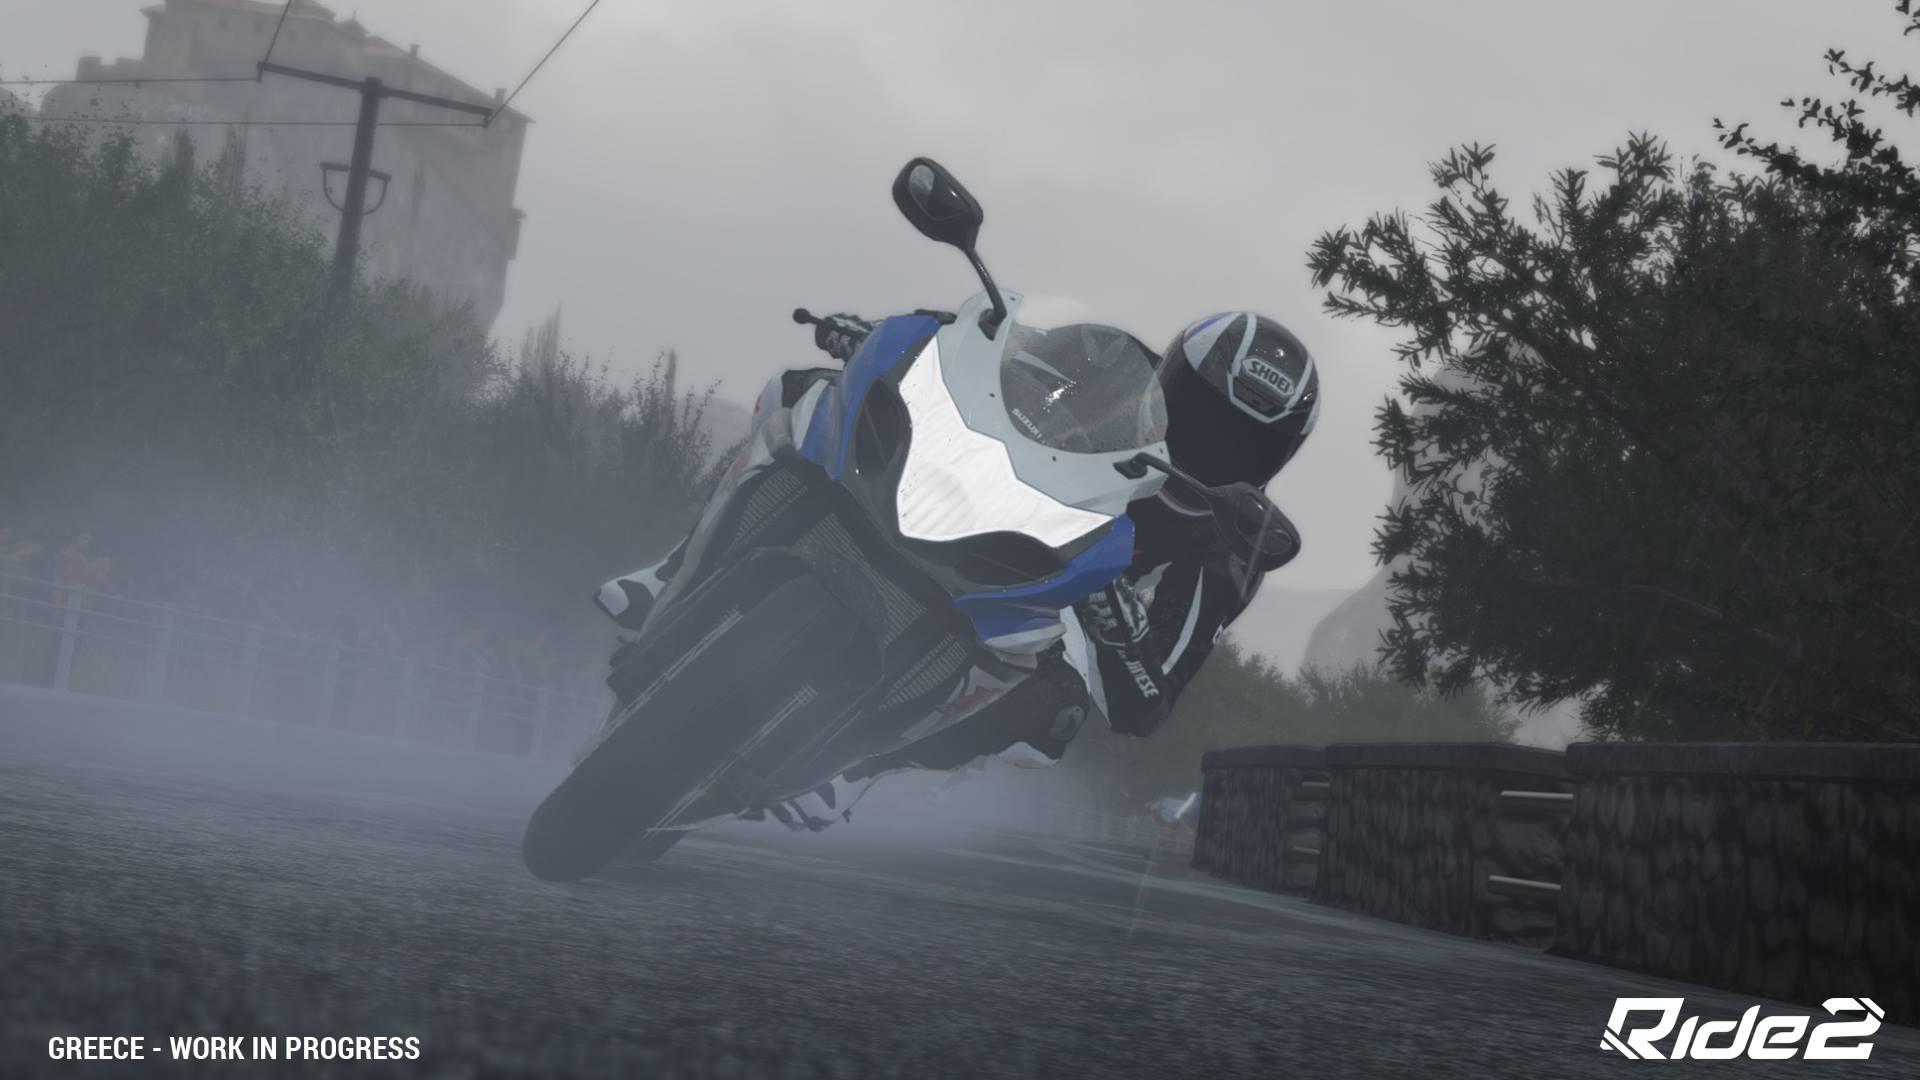 Ride2 A